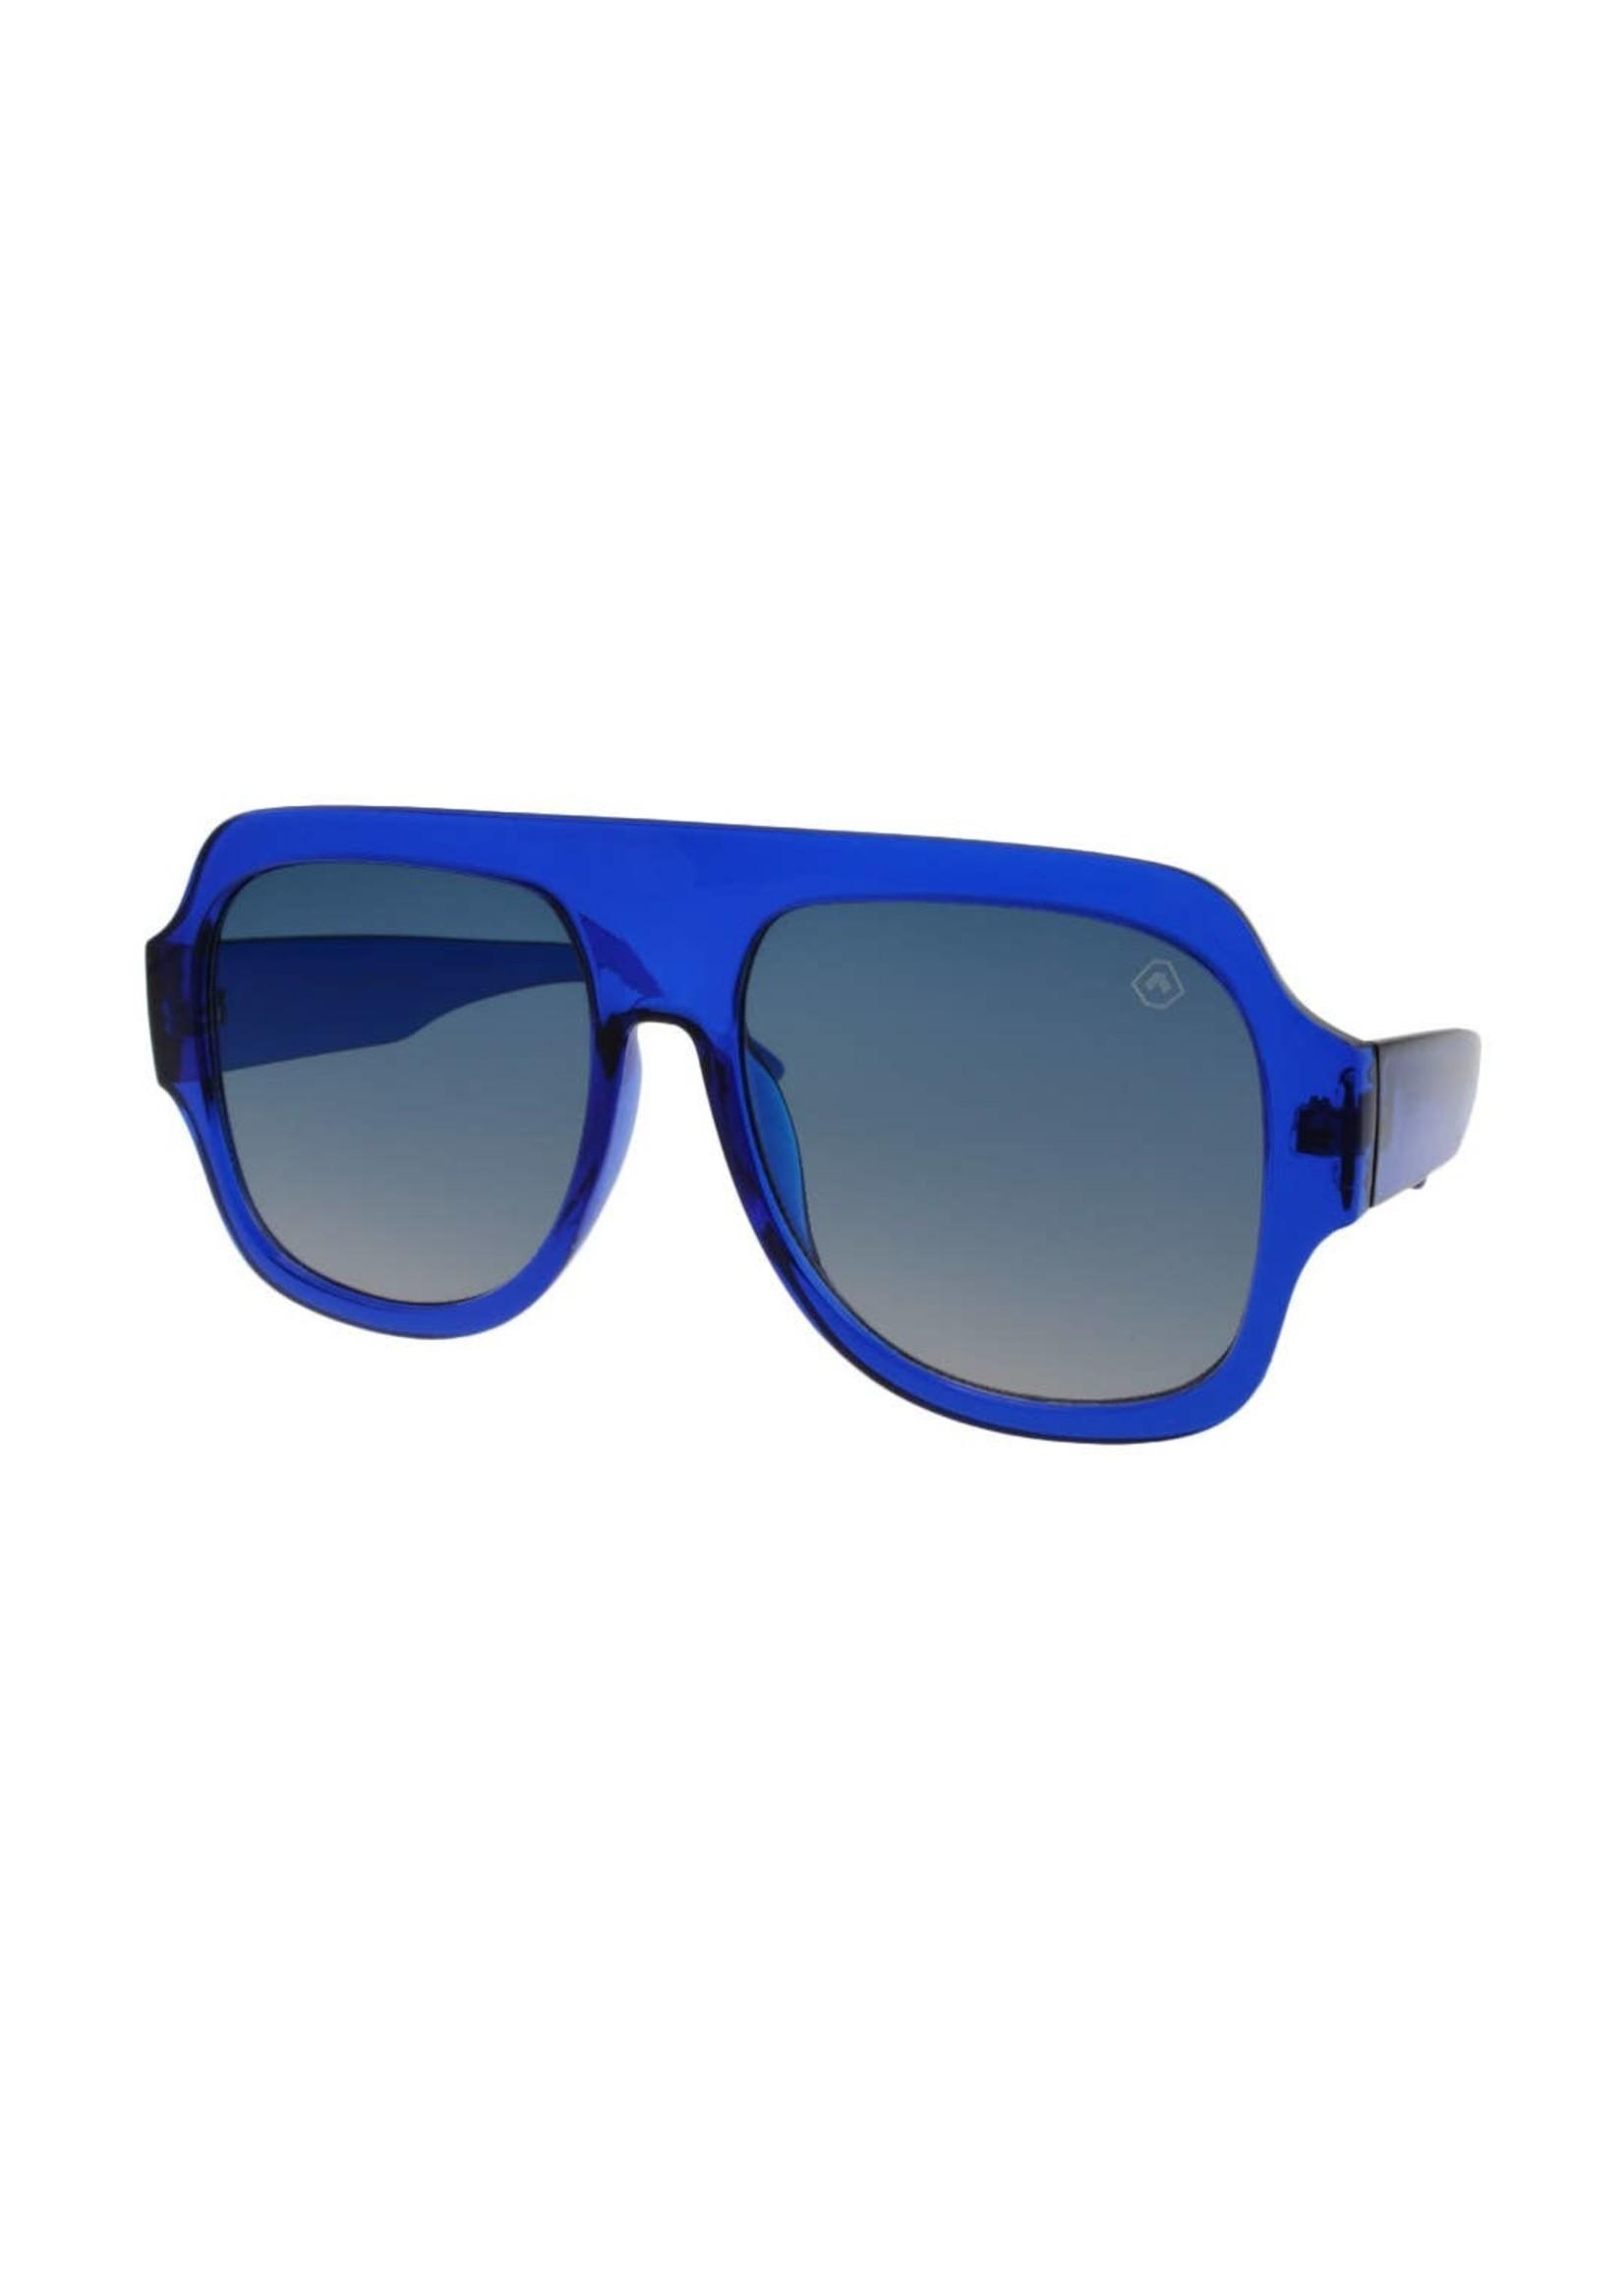 Chuck Men's Sunglasses-Blue